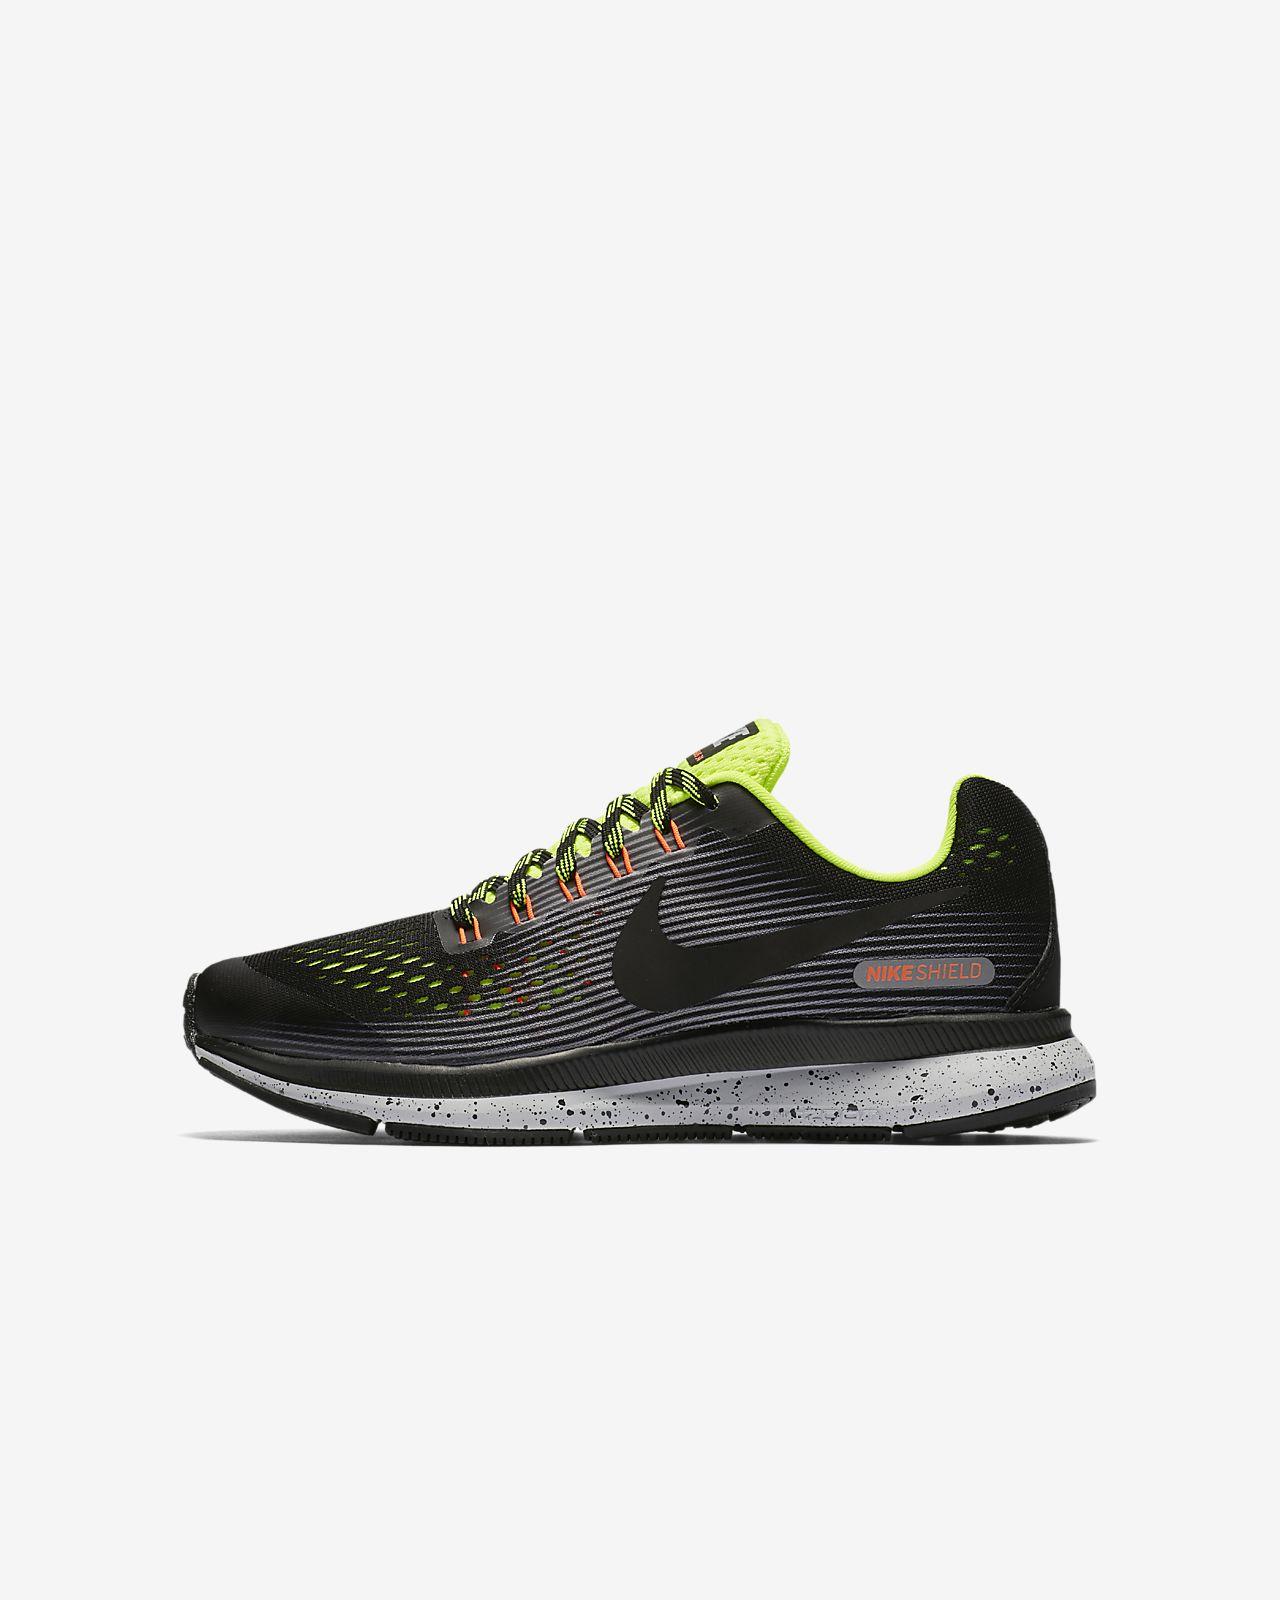 Nike AIR ZOOM PEGASUS 34 SHIELD Noir / Bleu - Chaussures Chaussures-de-running Femme